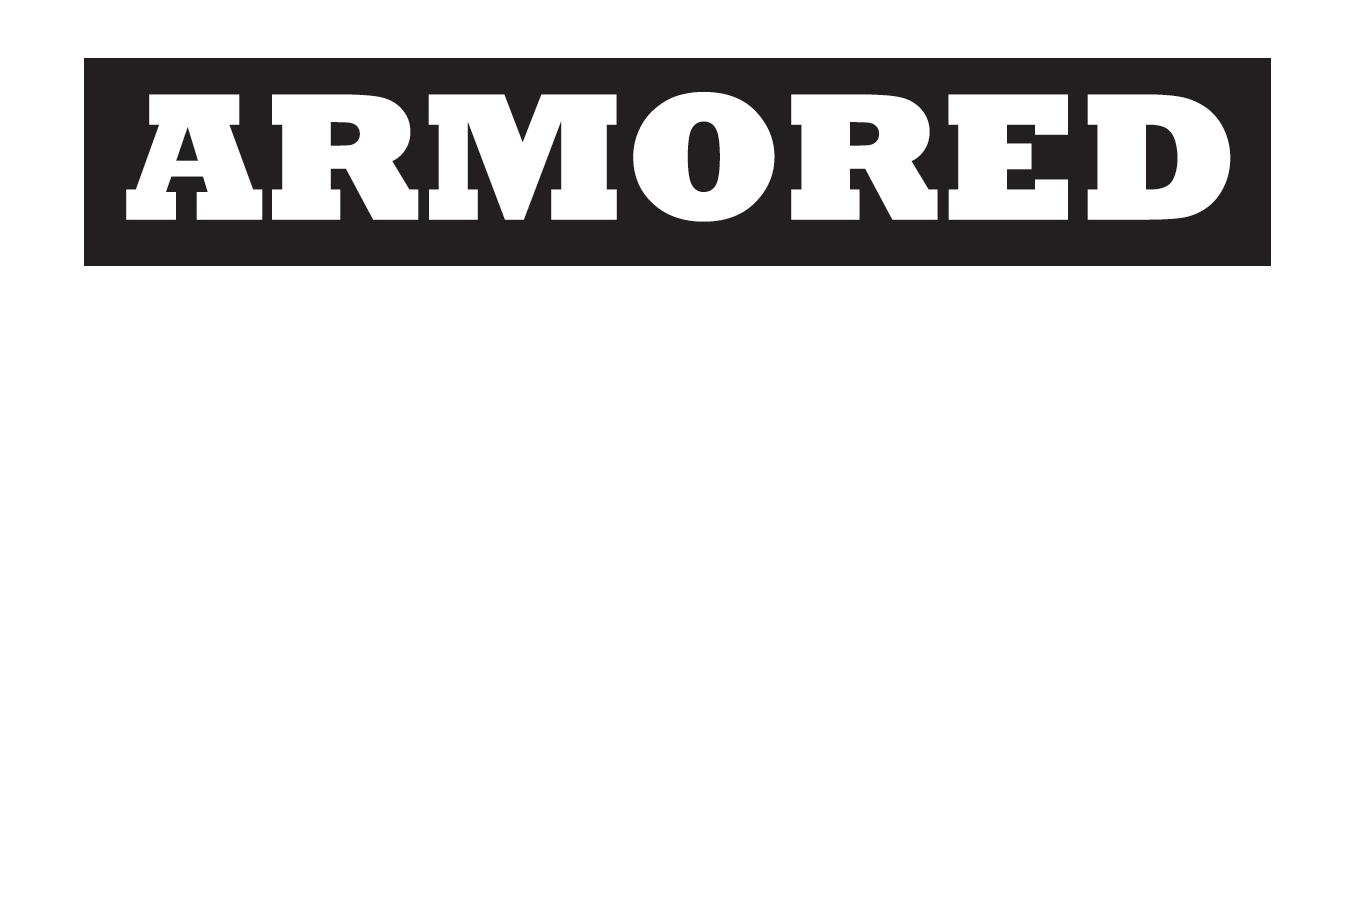 Armored Locking Mailbox Installations logo white